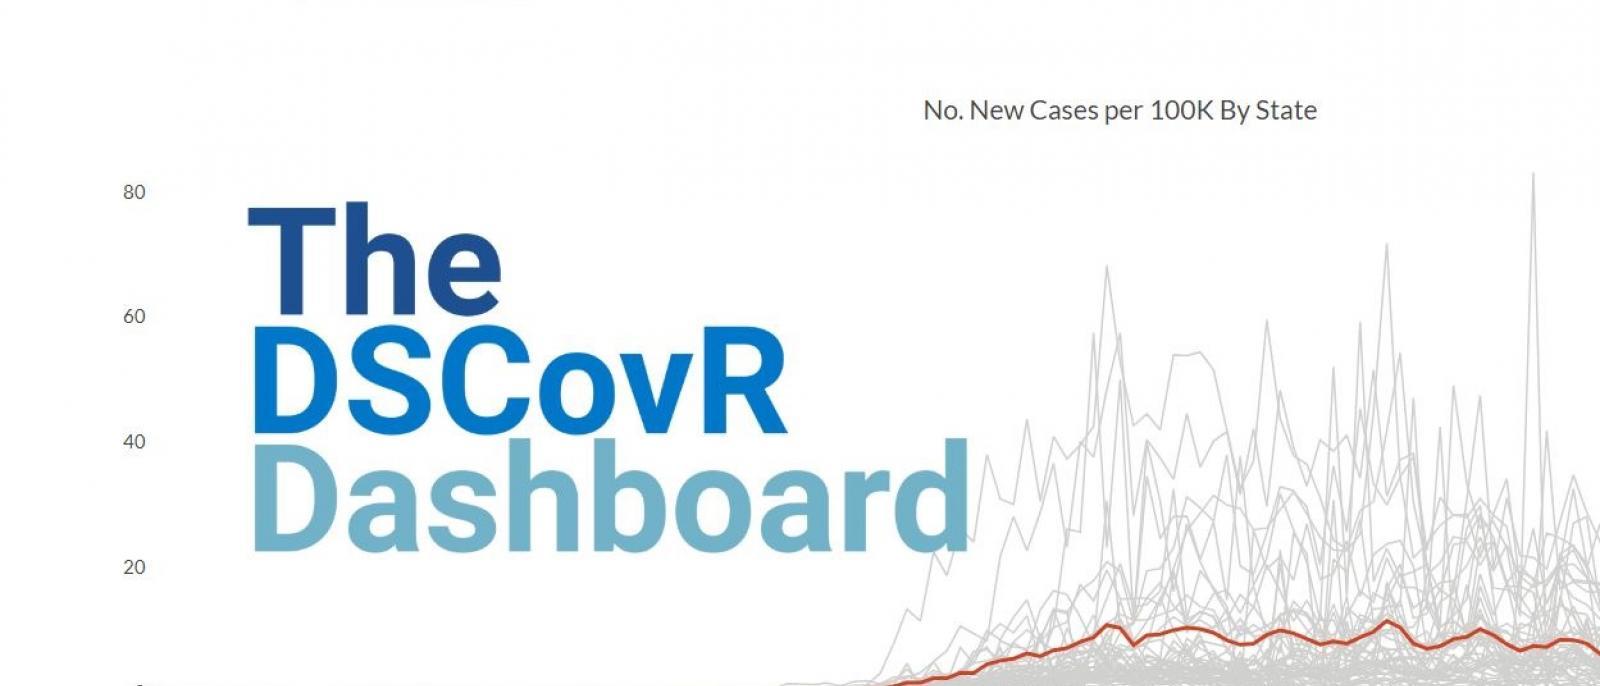 homepage image of data dashboard